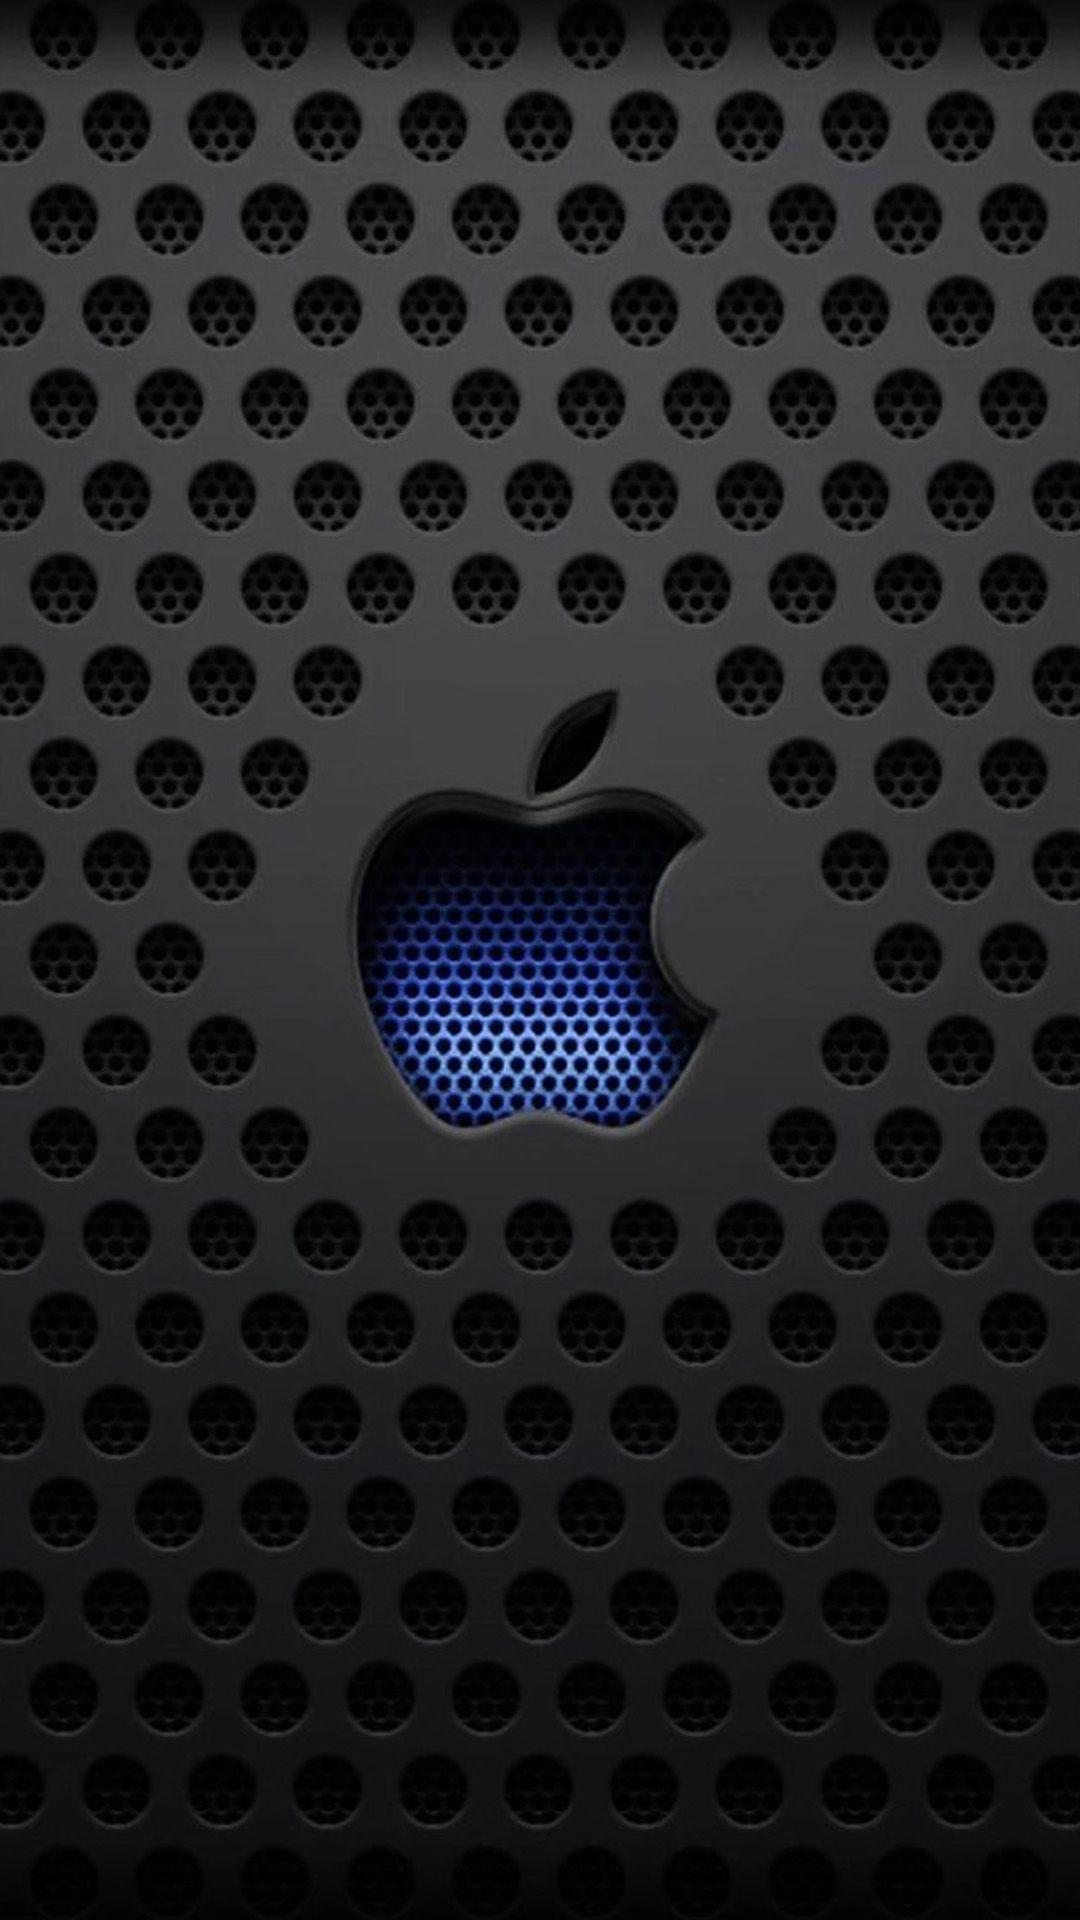 Pin by Jade Borade on General | Apple logo wallpaper ...